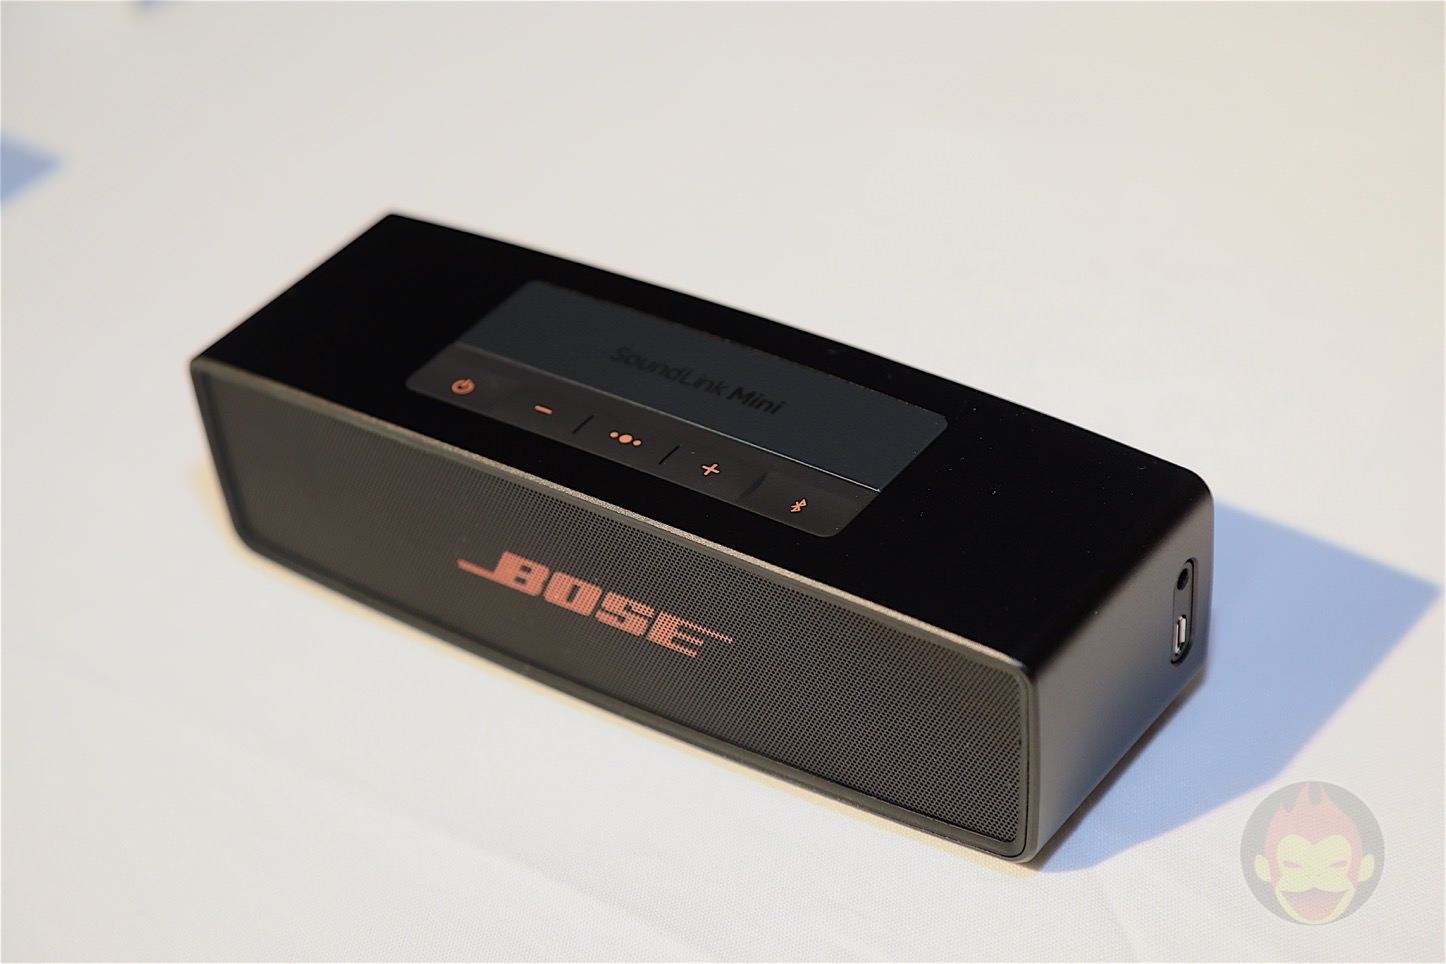 Bose-Soundlink-Mini-2-Black-Copper-05.jpg